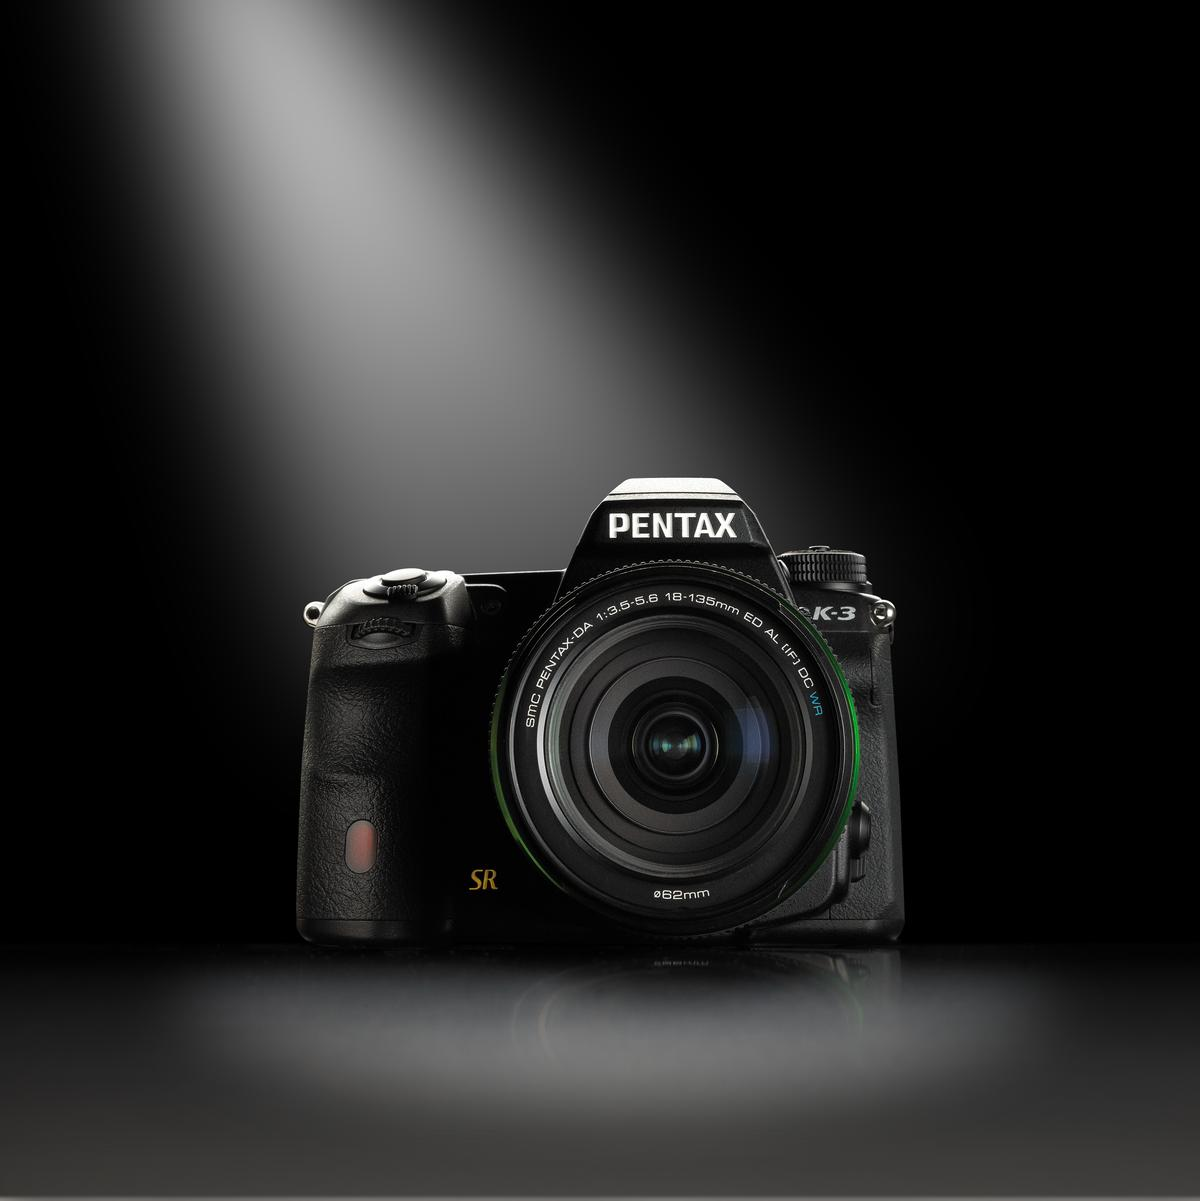 The Pentax K-3 DSLR from Ricoh Imaging